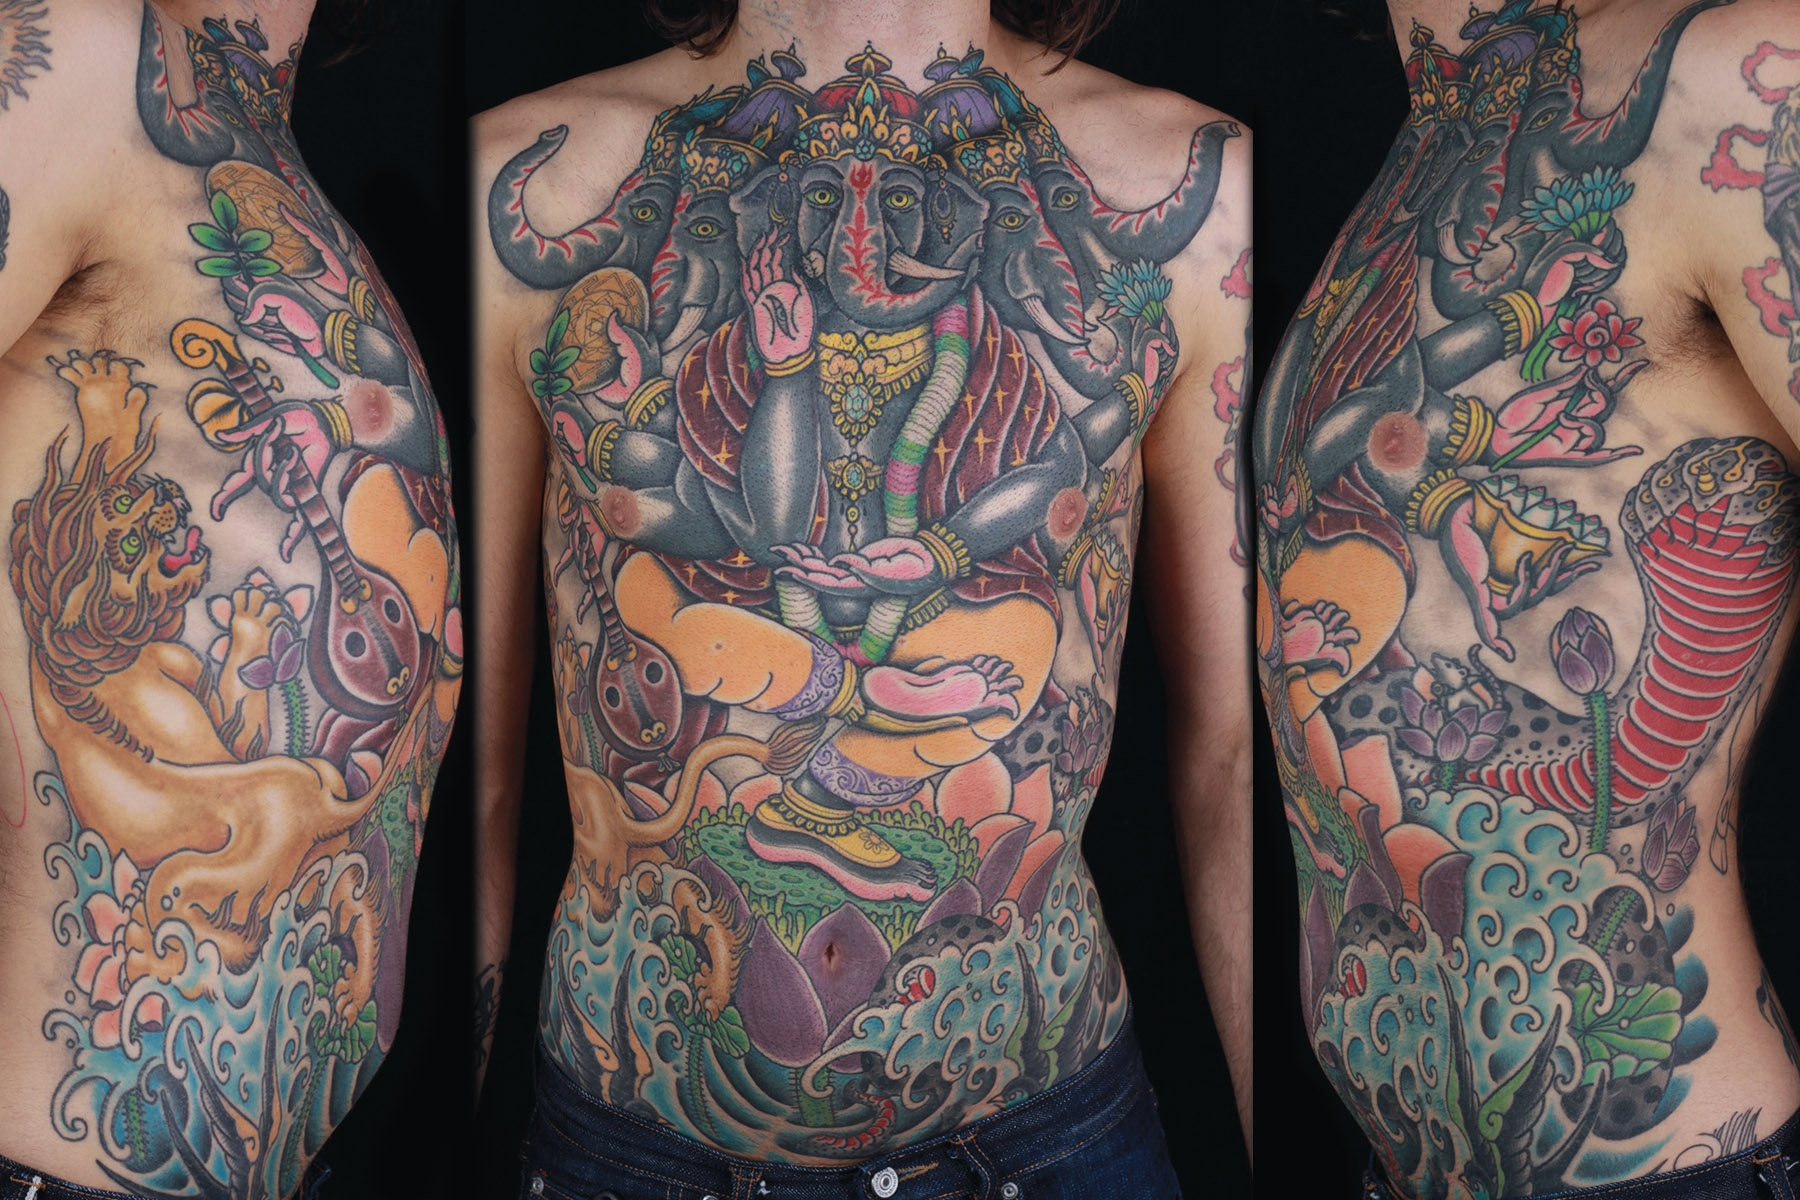 sam-yamini-dedication-tattoo-ganesh-lion-lotus-water-waves-cobra-stomach-ribs